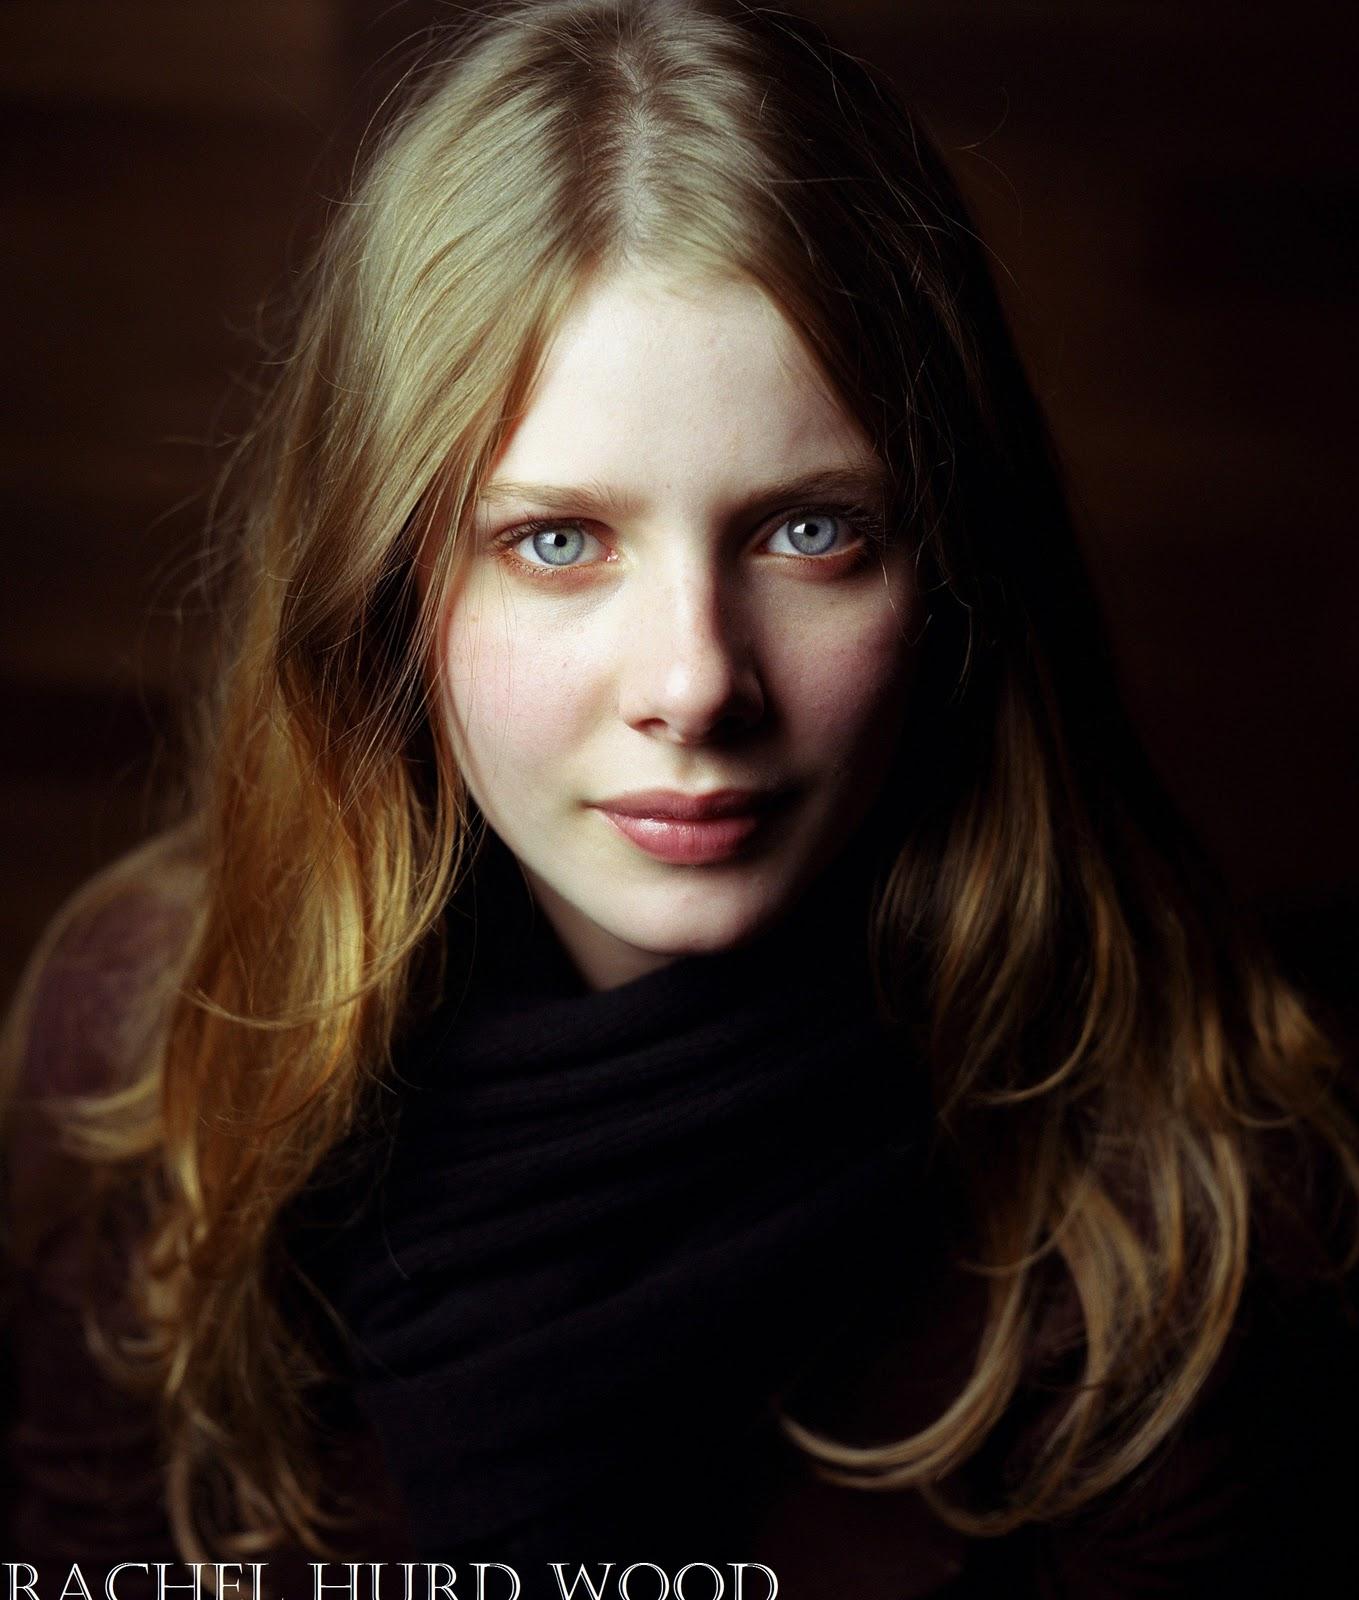 Rachel Hurd-Wood (born 1990)